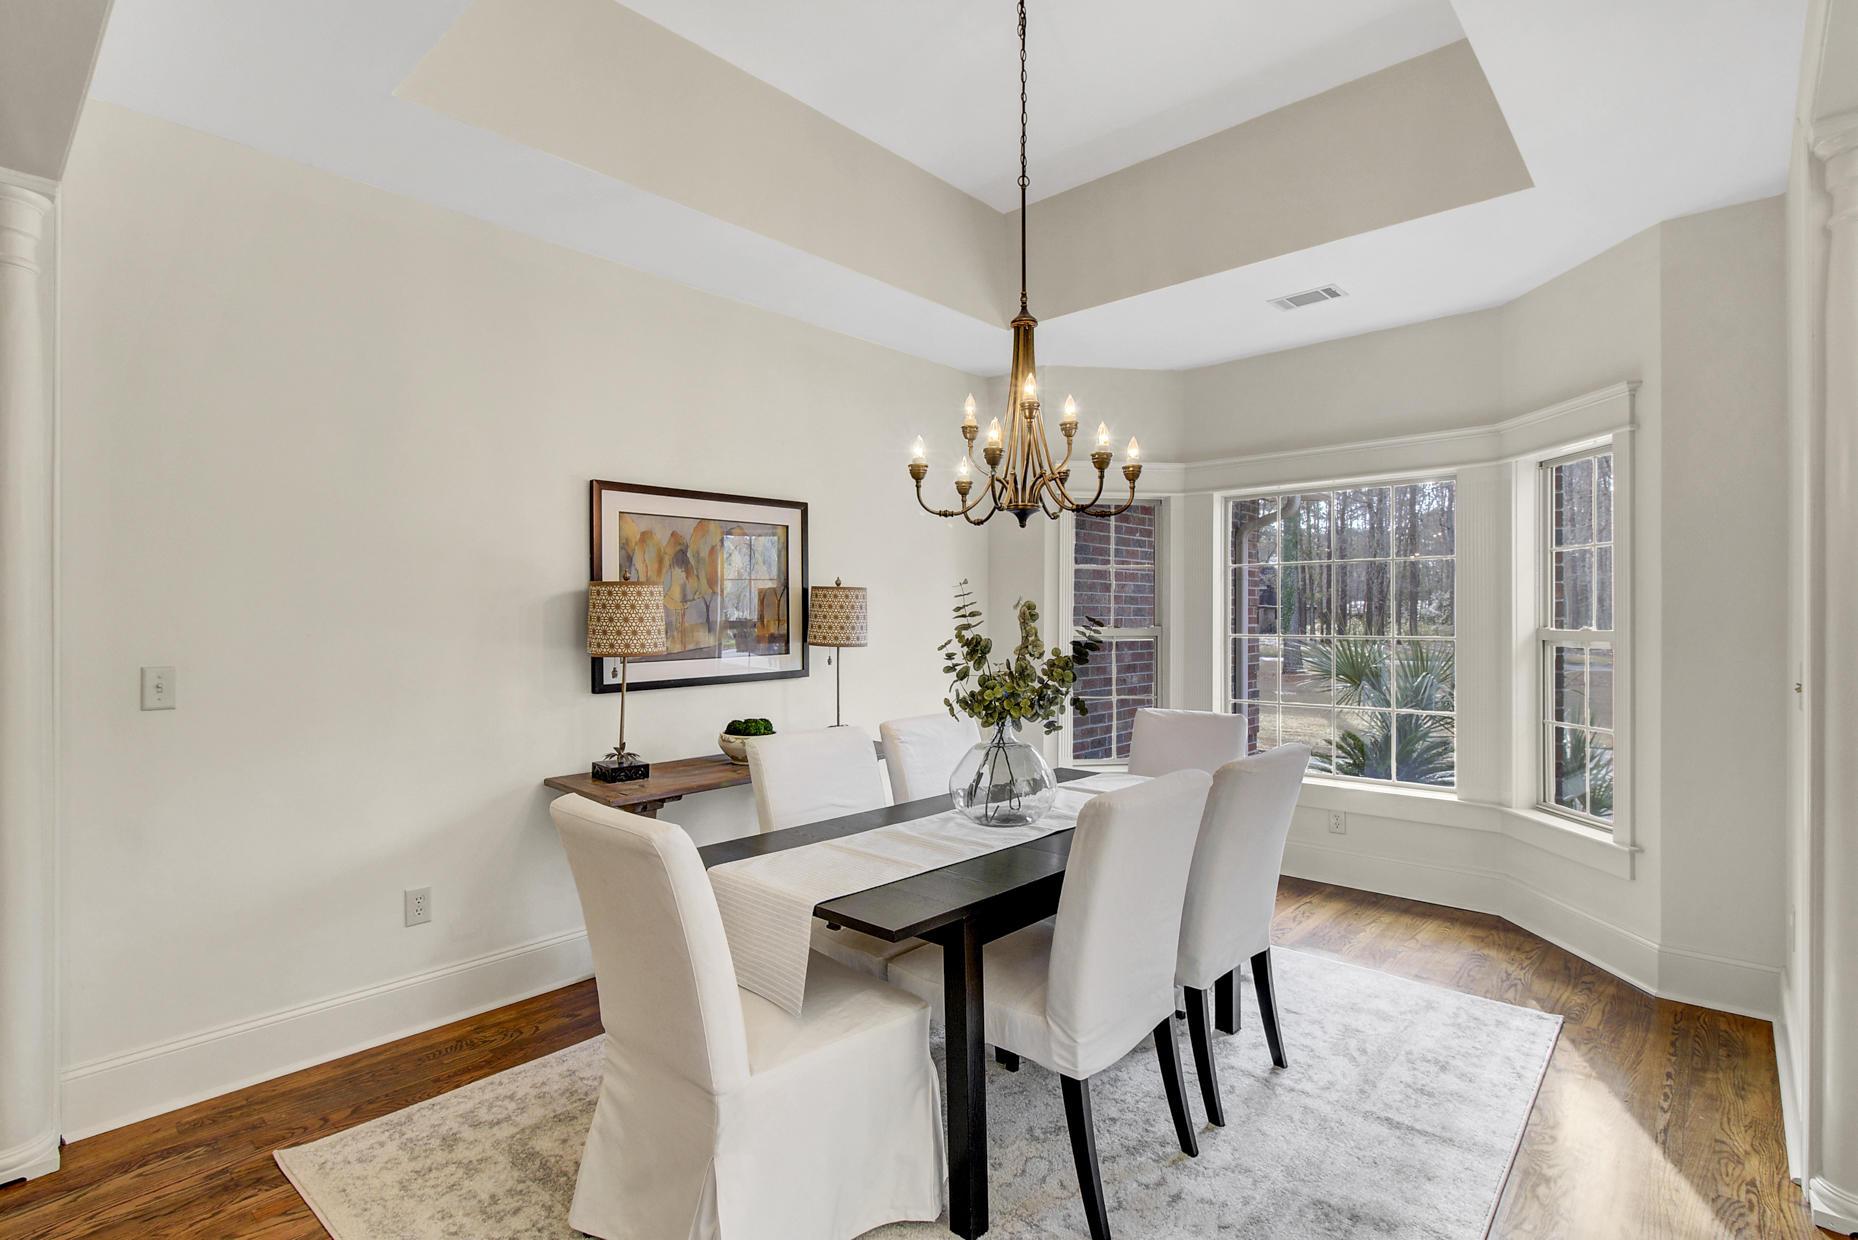 Dunes West Homes For Sale - 4123 Colonel Vanderhorst, Mount Pleasant, SC - 24